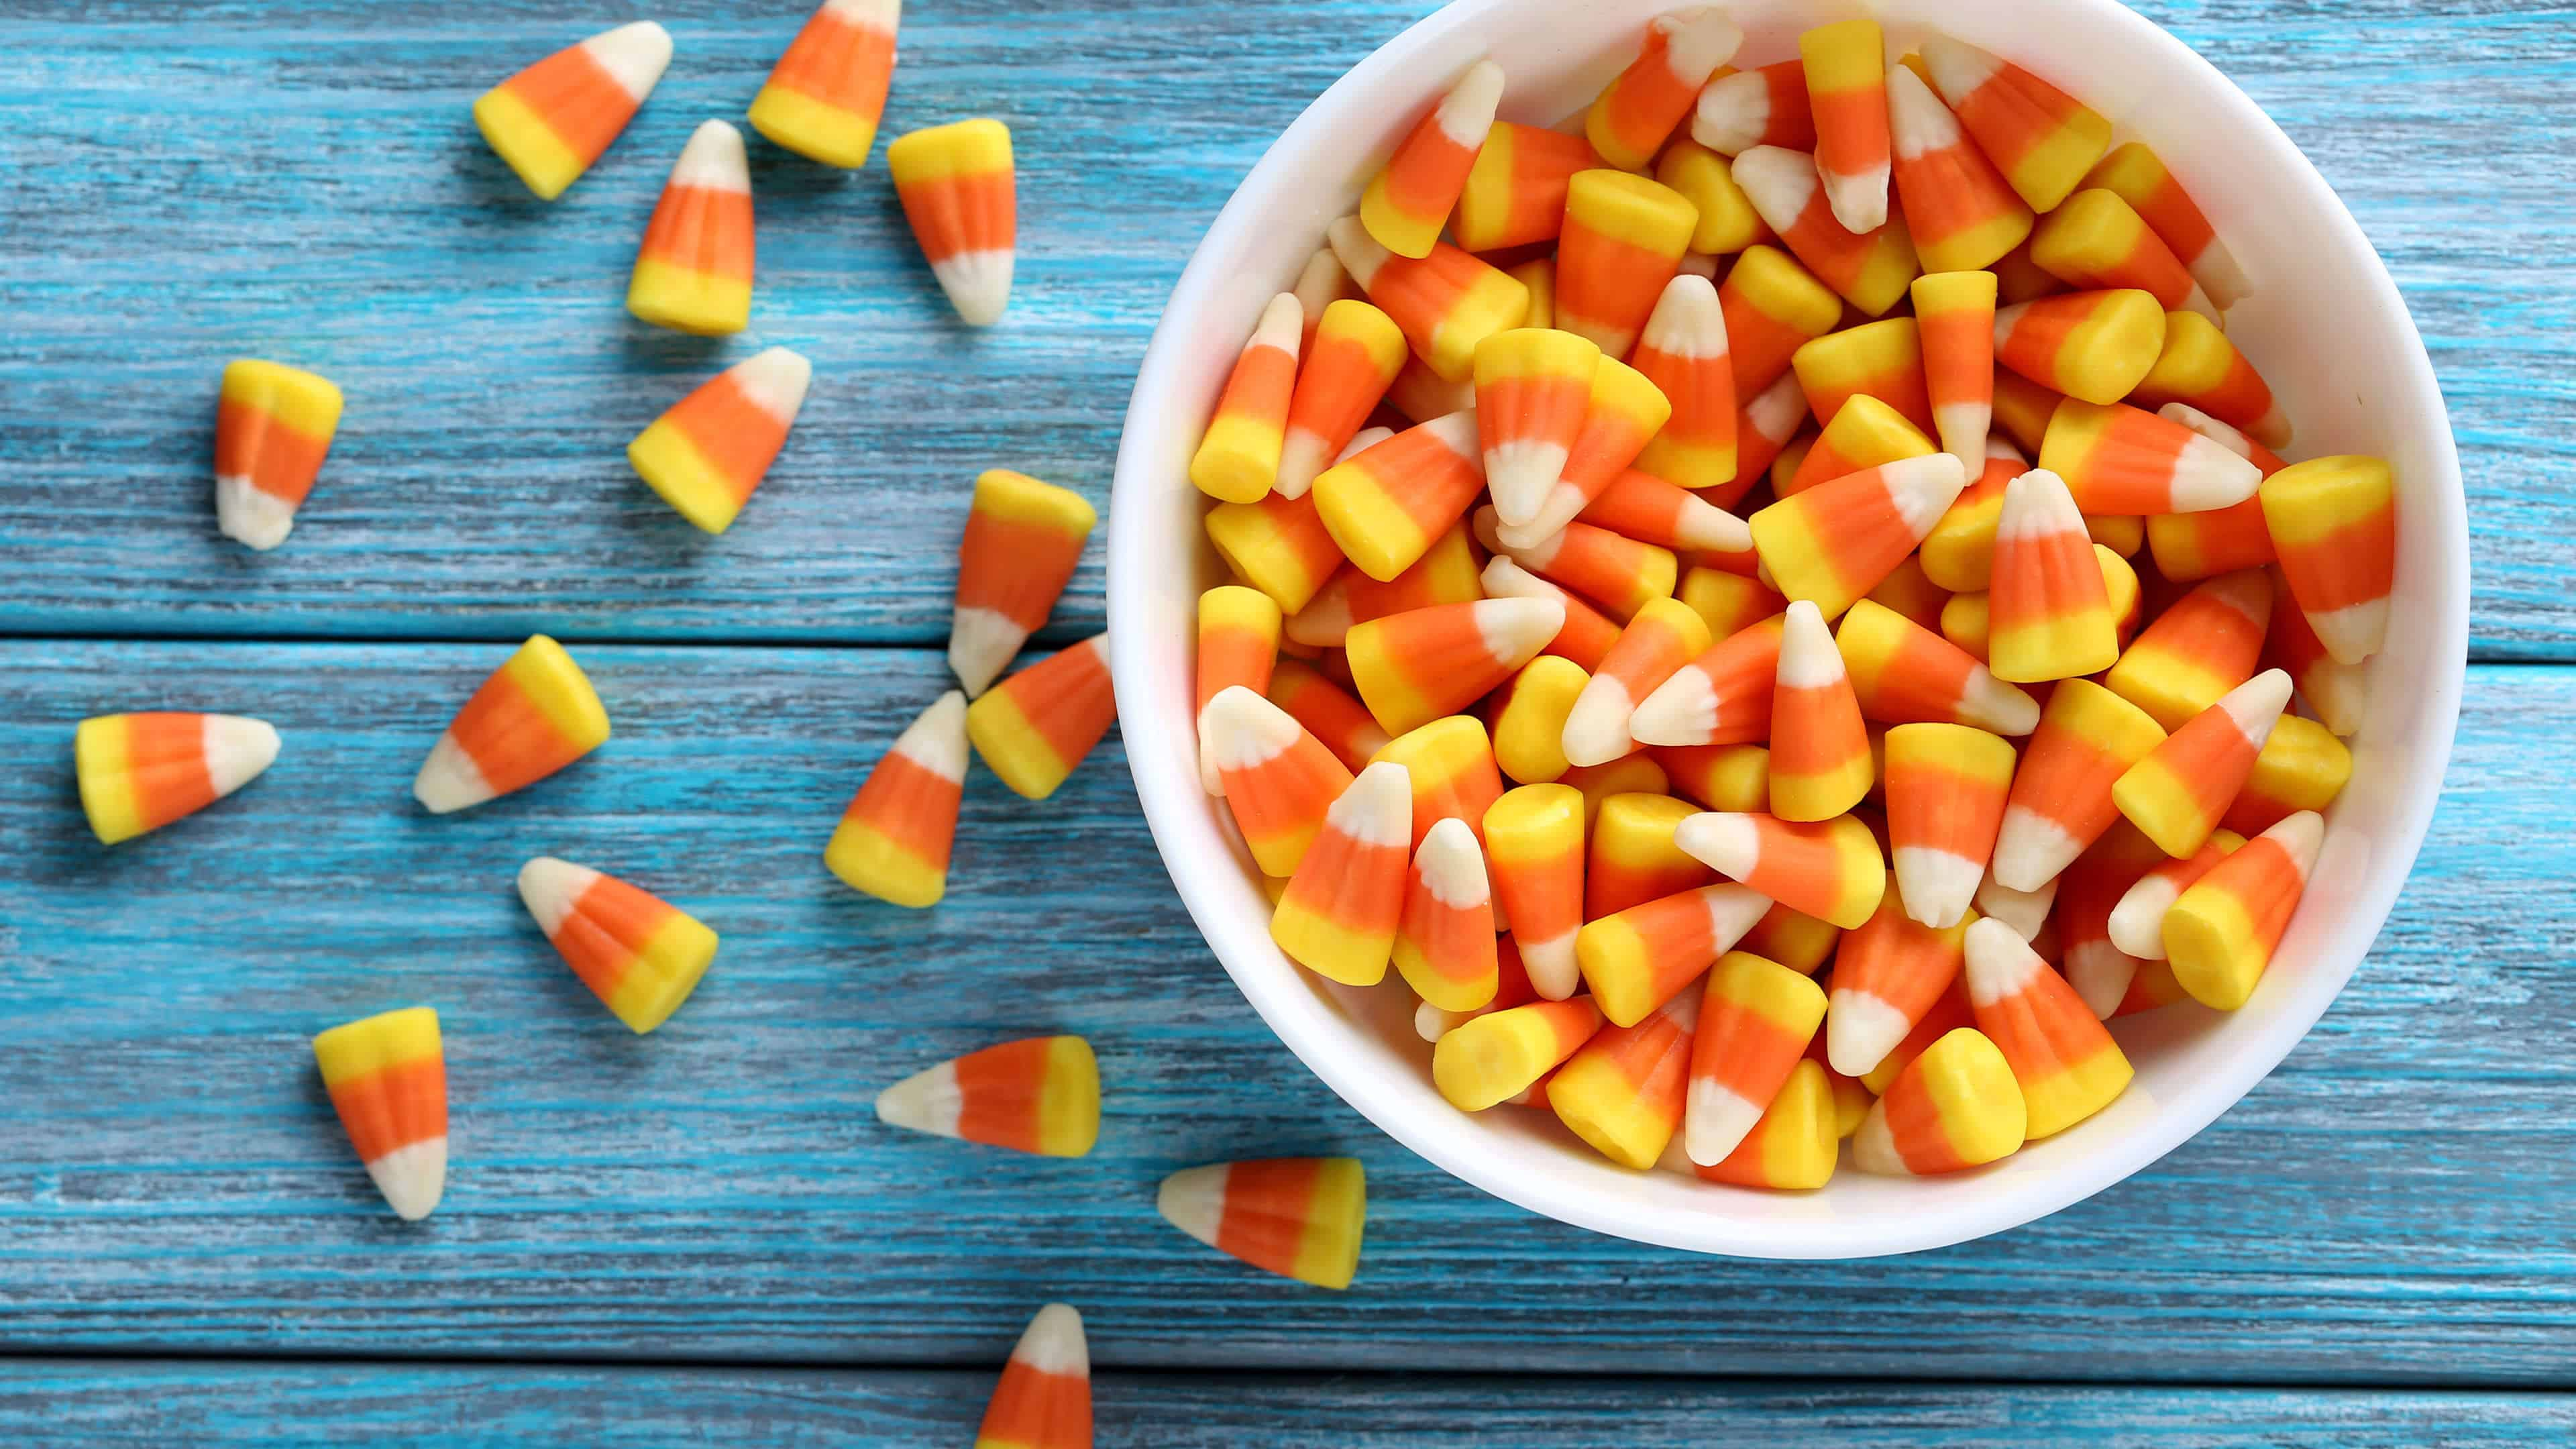 candy corn uhd 4k wallpaper